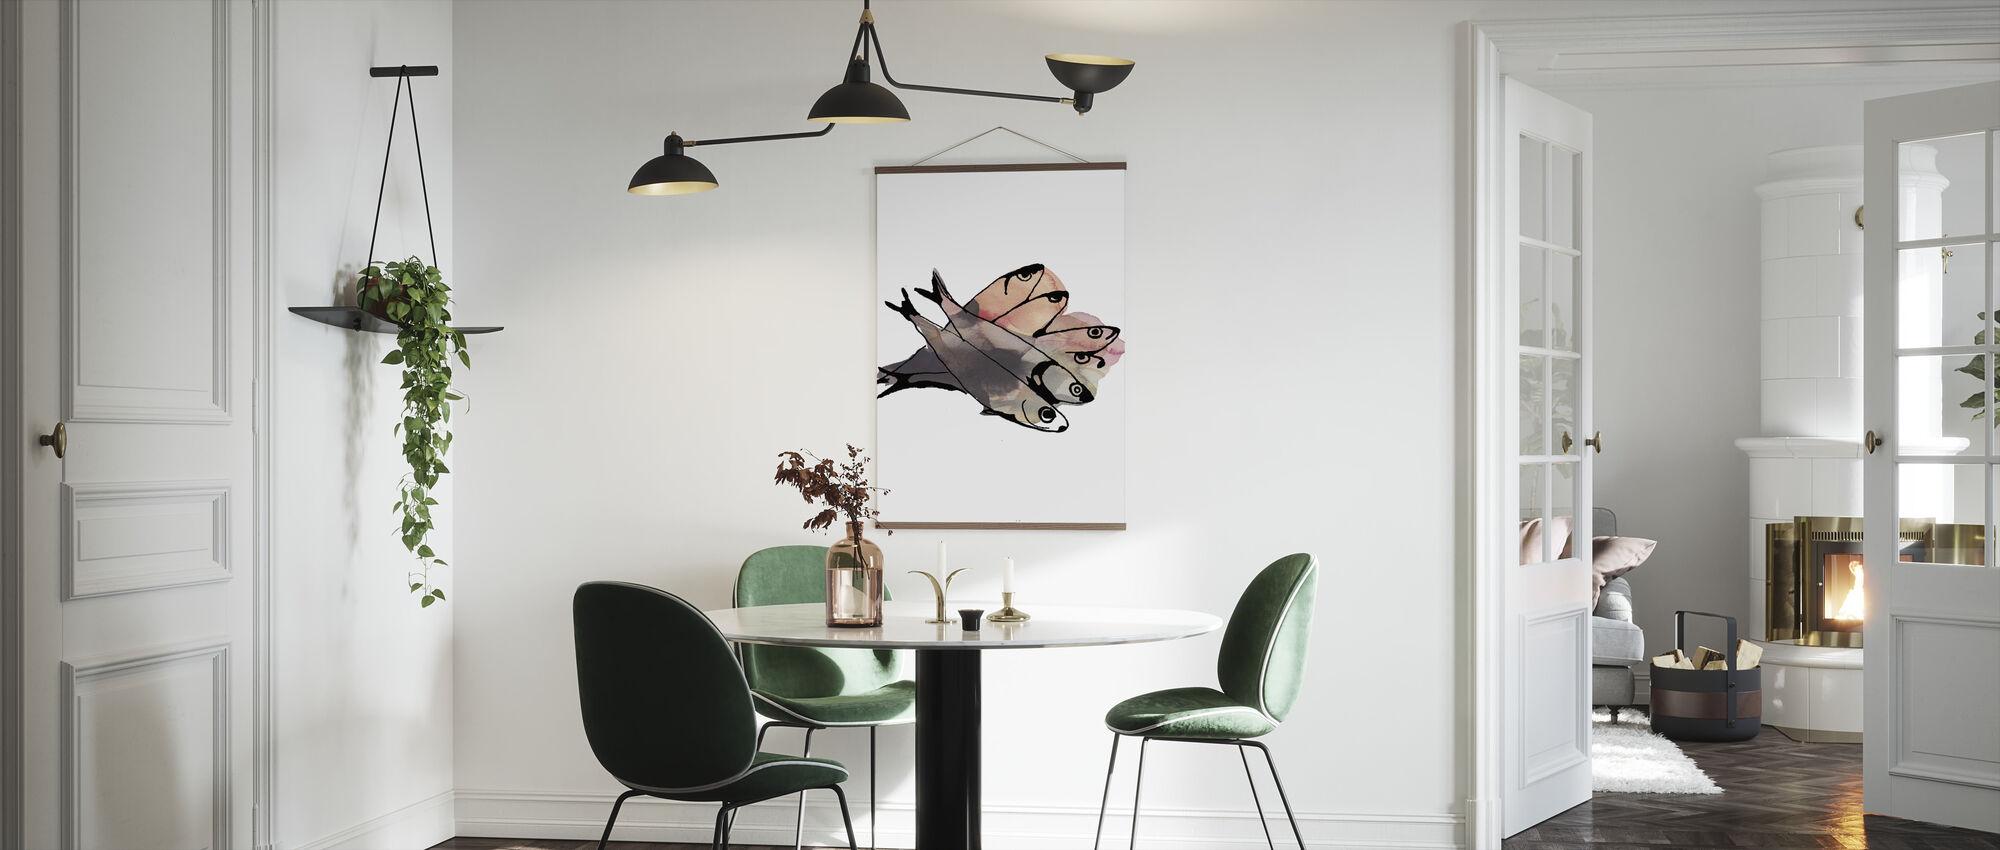 Herring - Poster - Kitchen